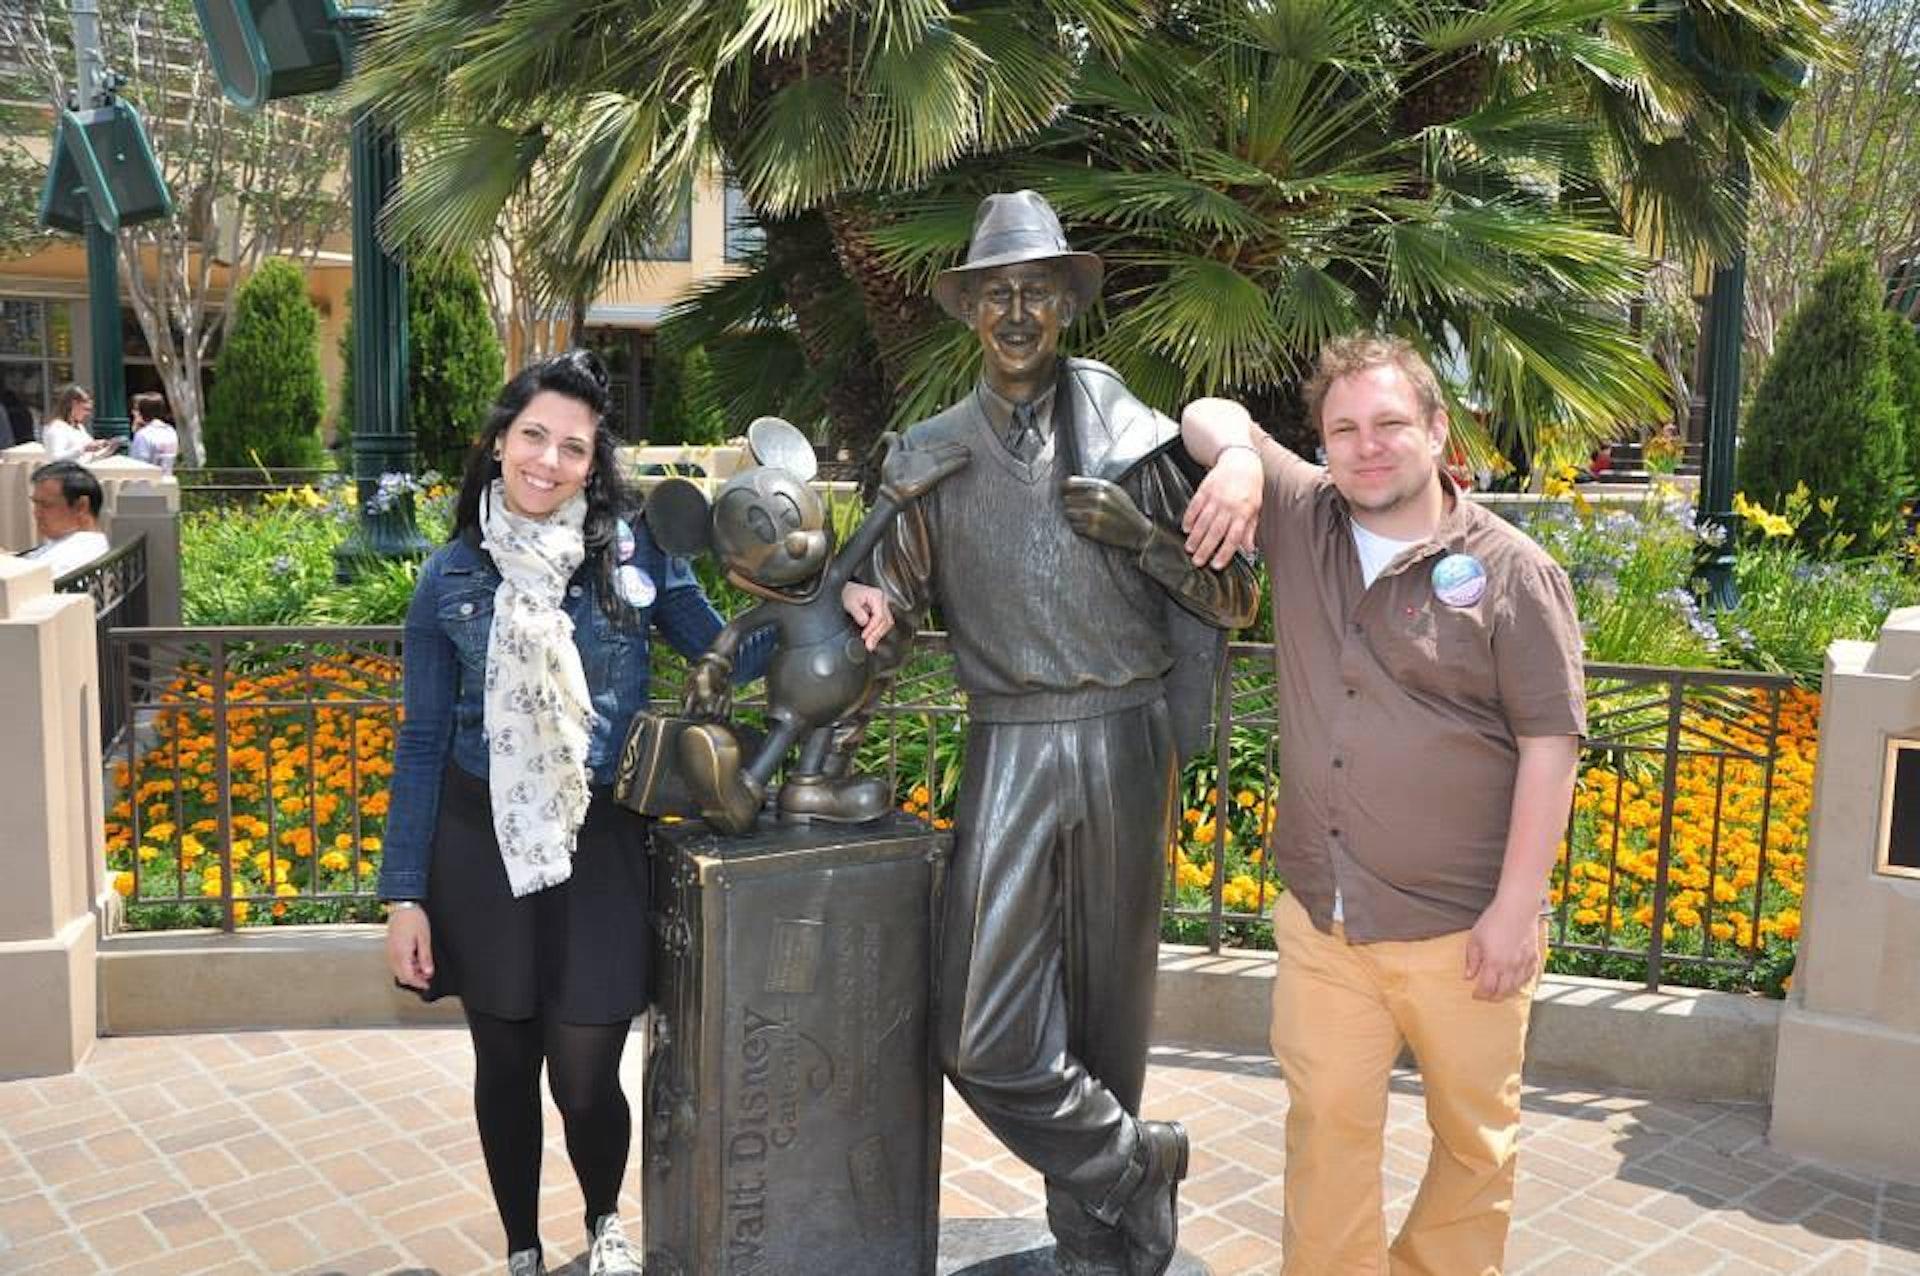 Josh and Angie Taylor at Disneyland